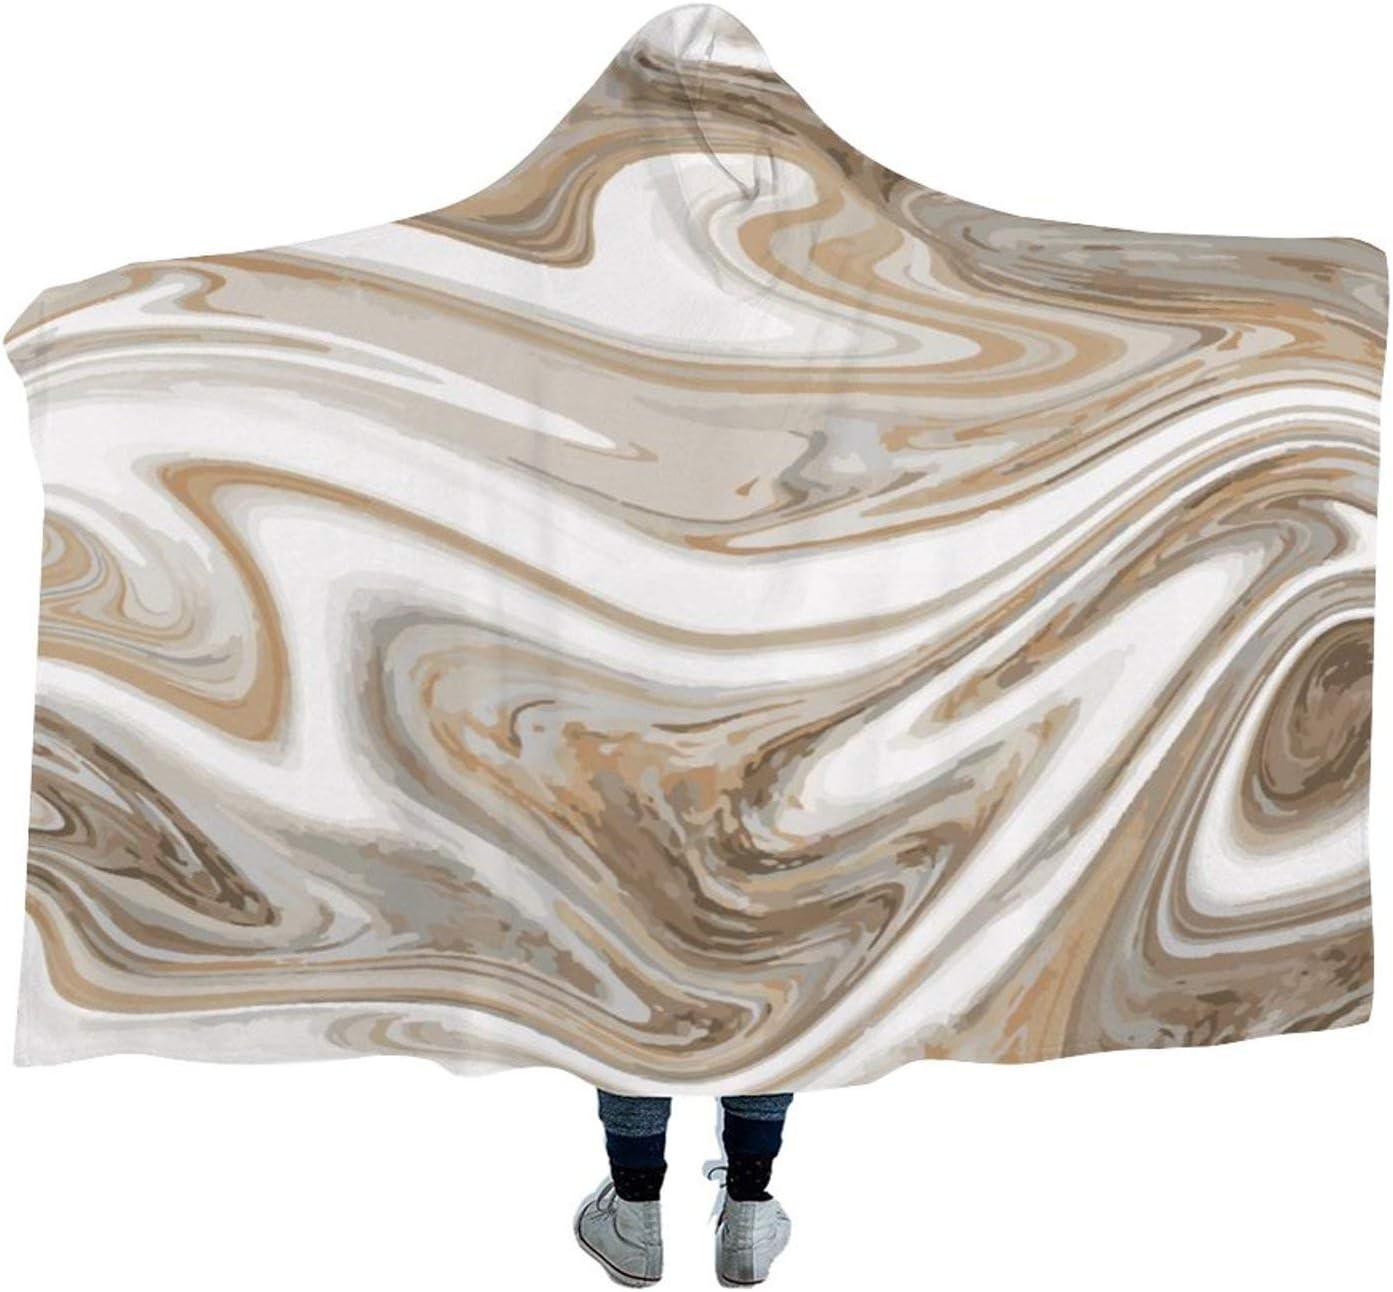 Hooded Blanket Soft 海外並行輸入正規品 Hoodie Sweatshirt 情熱セール Wearable